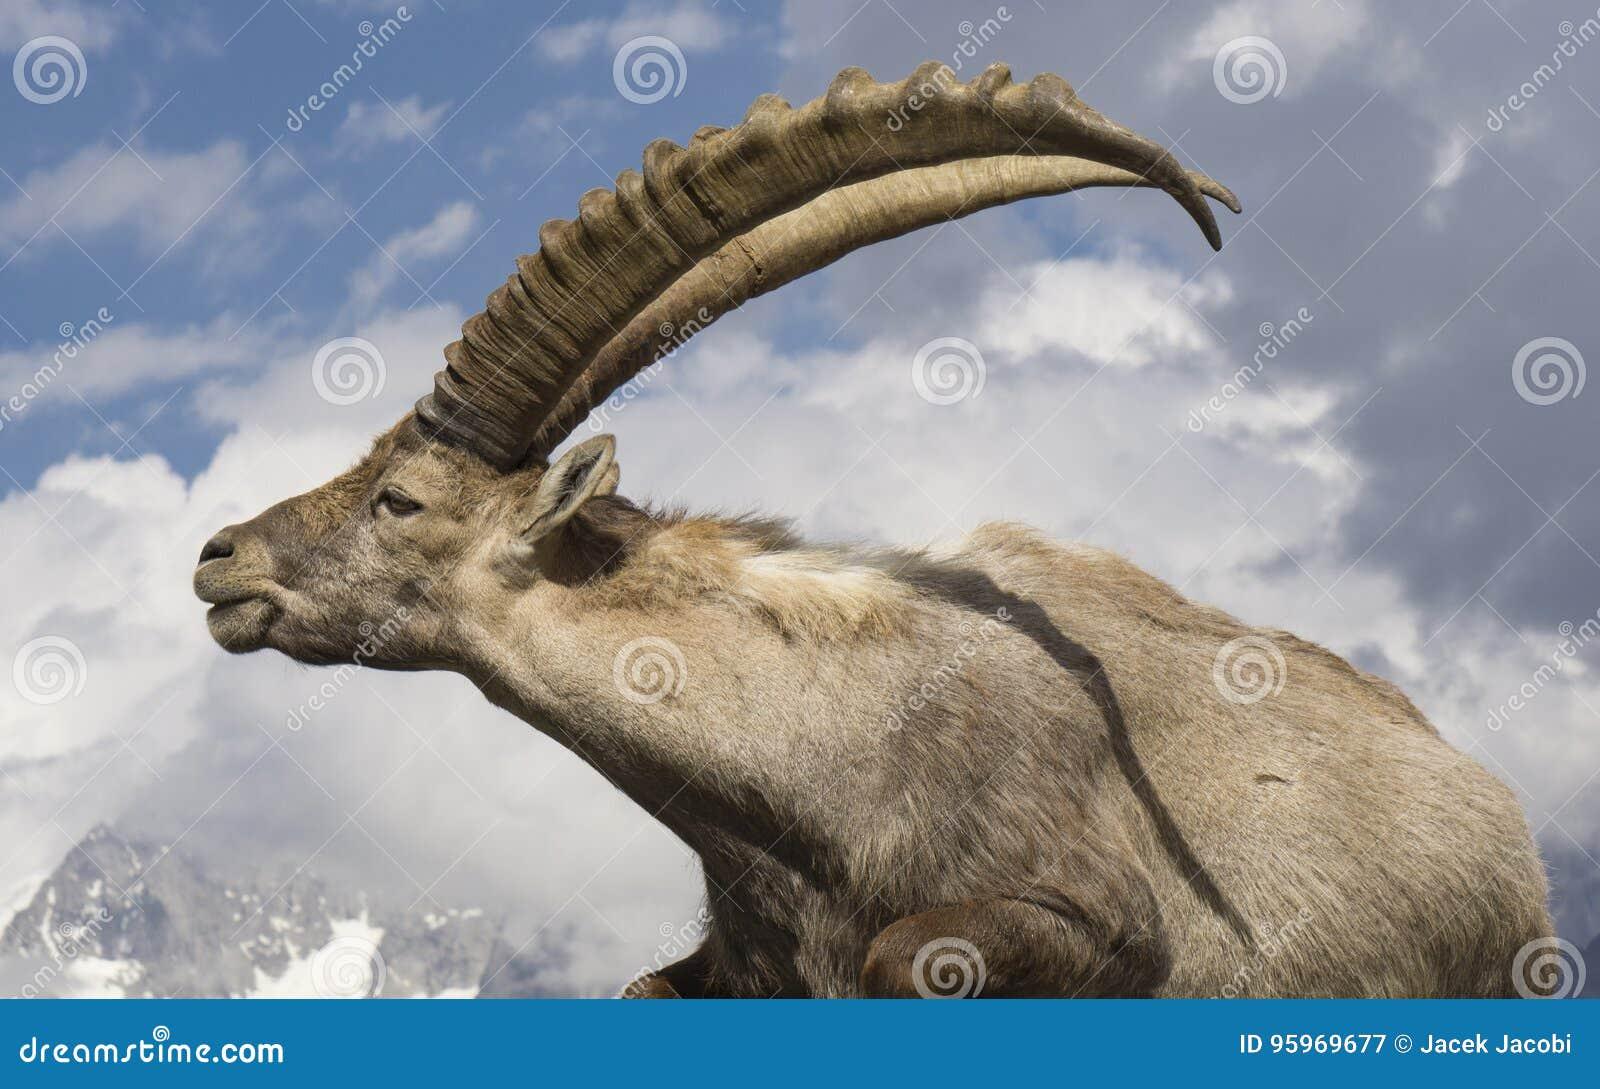 Ibex against the sky. Alps. France.